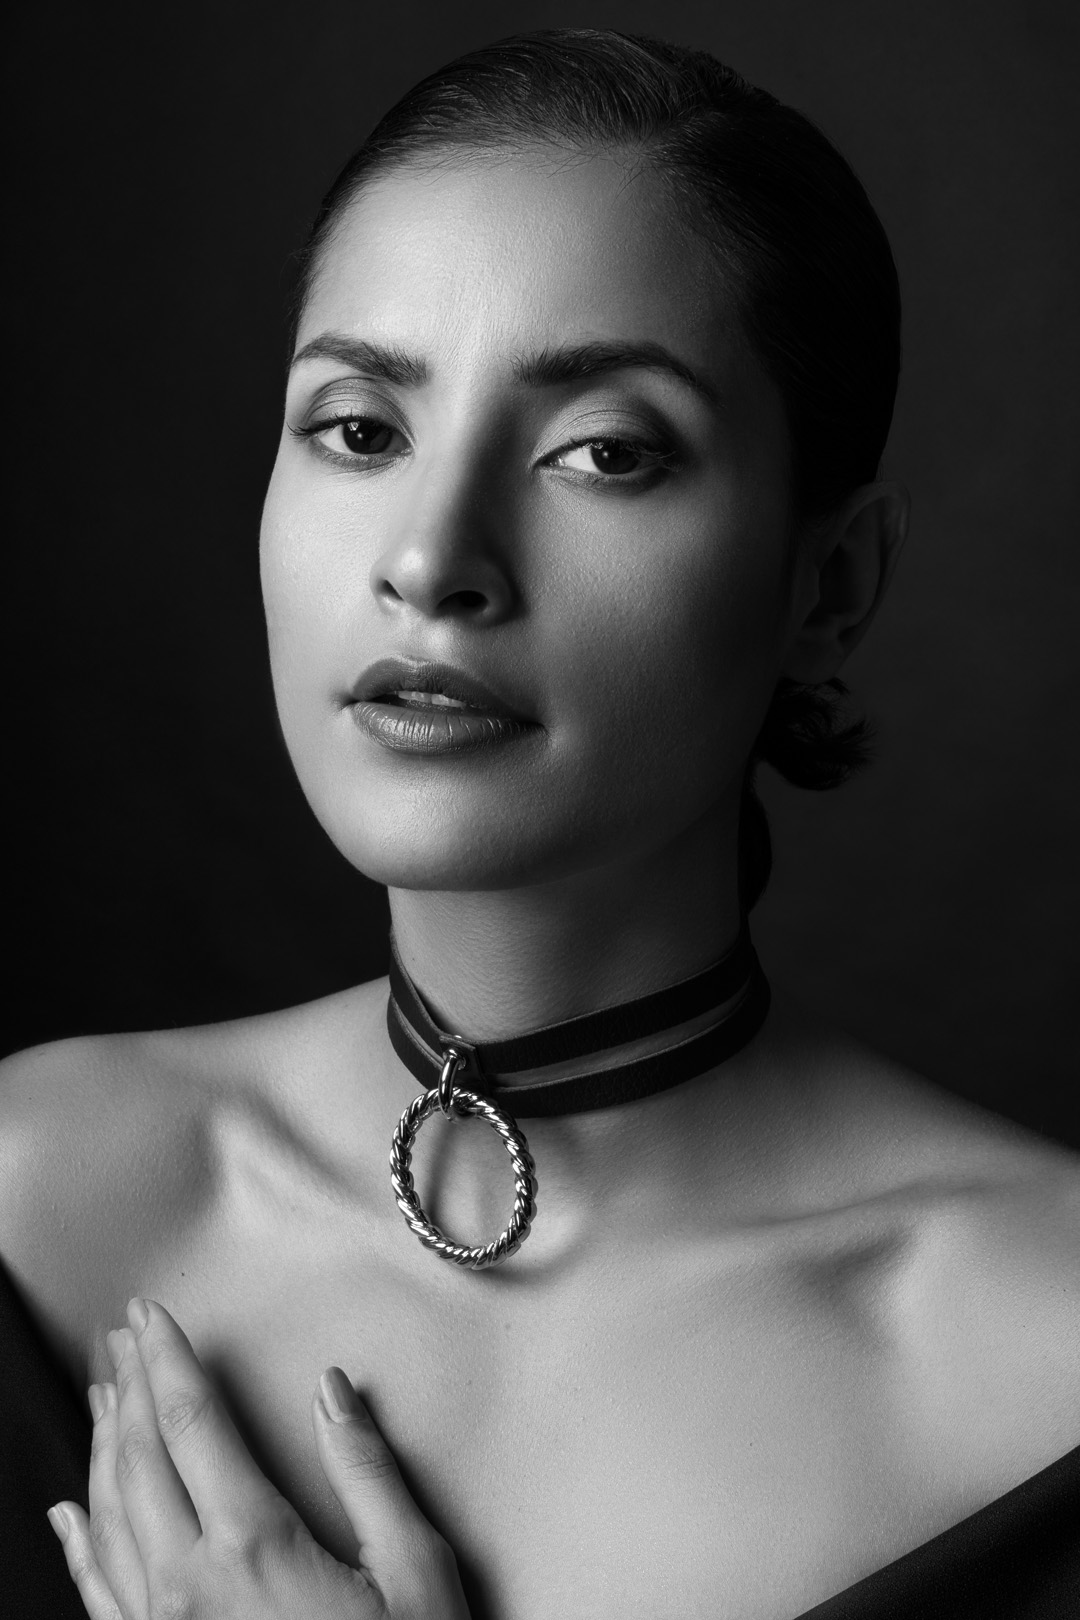 Black-and-white beauty portrait of Camilla Cardona (Internationally published model) shot in Fotografie Berlin e.V. studio (Berlin, Neukölln)